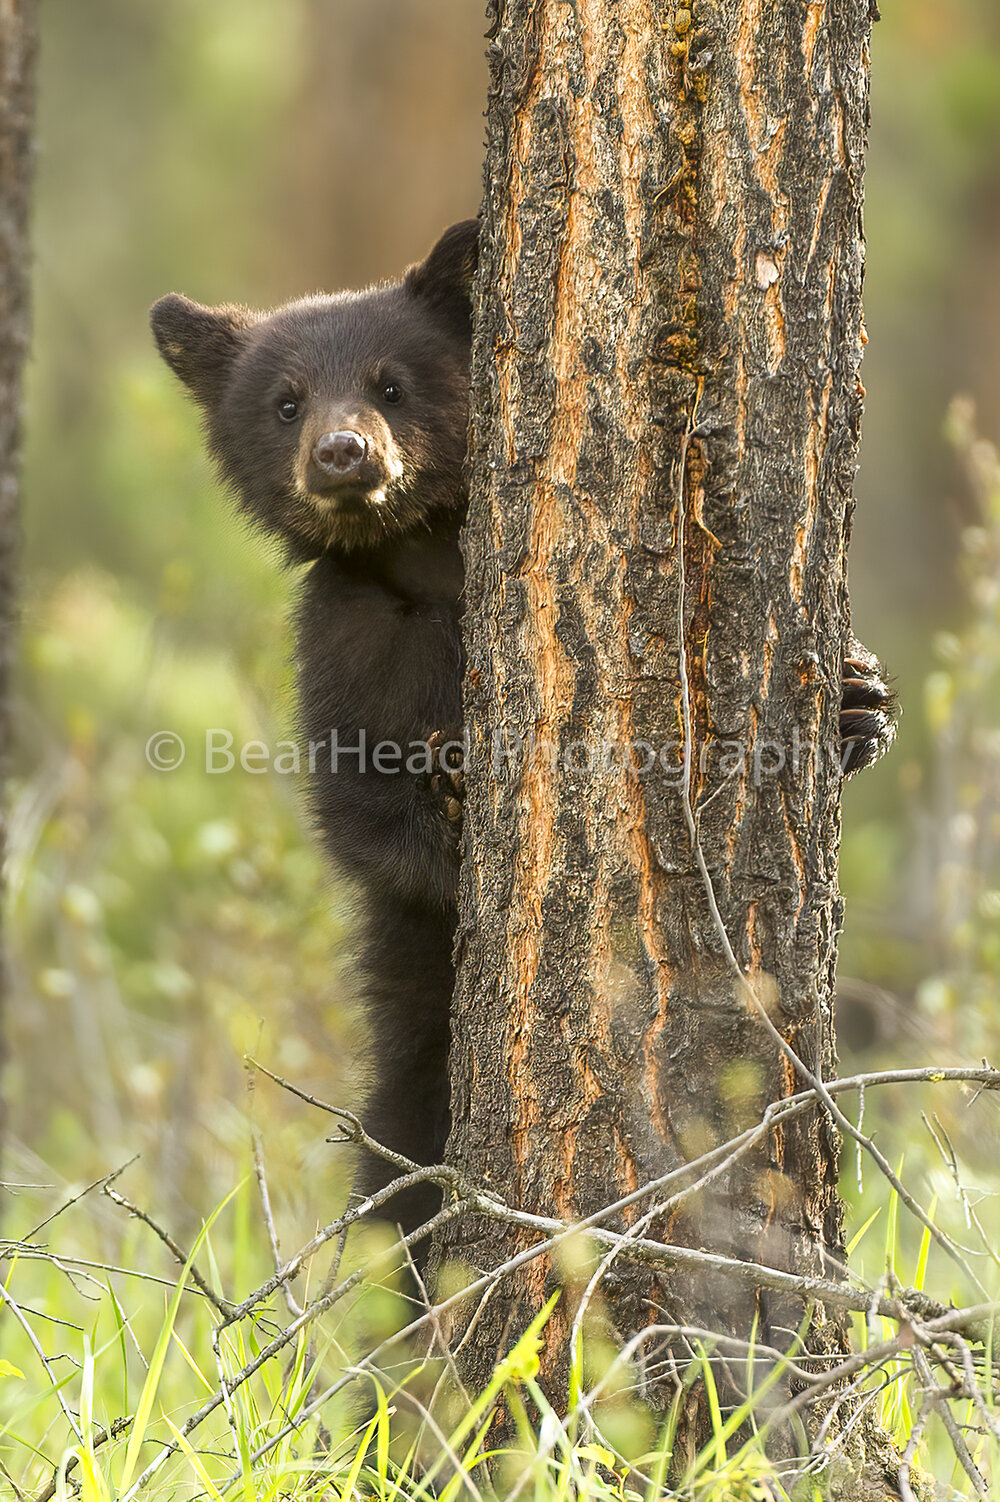 Tree Hiding